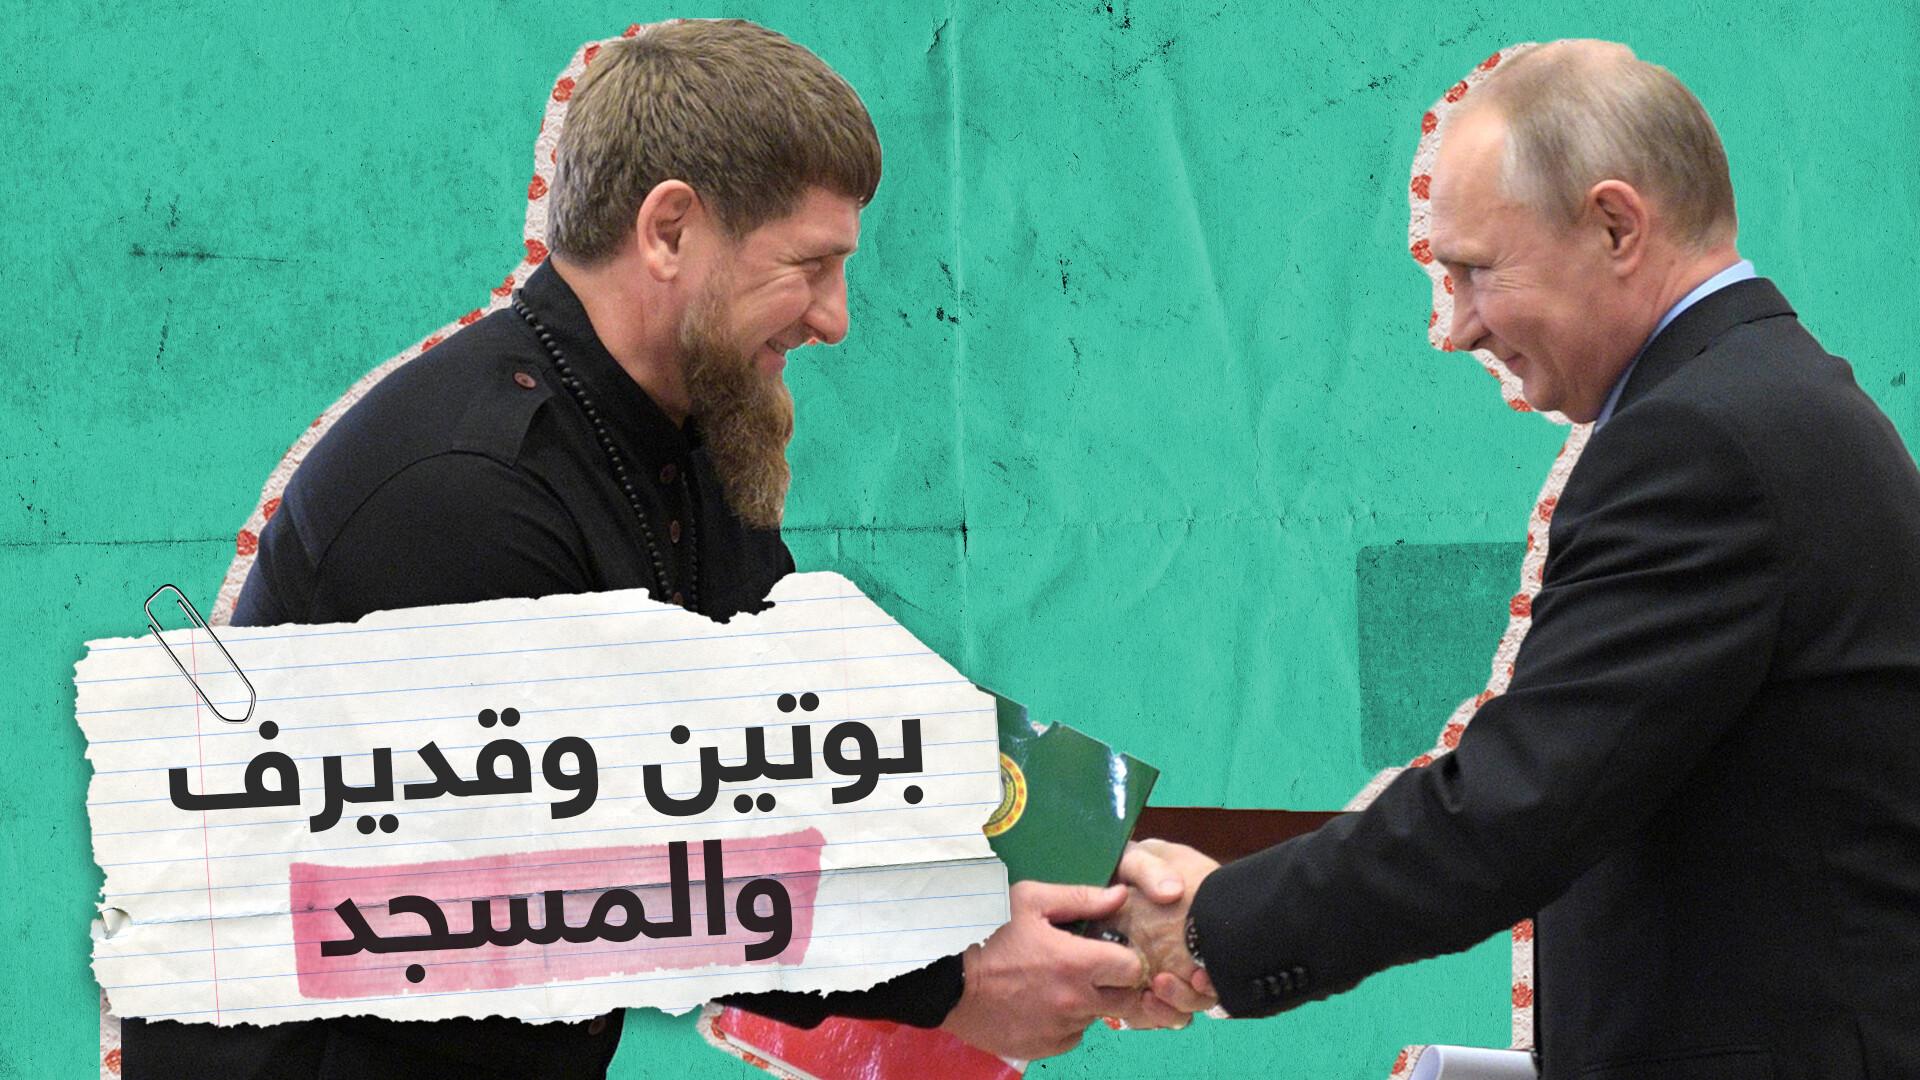 حوار صريح بين بوتين ورمضان قوديروف